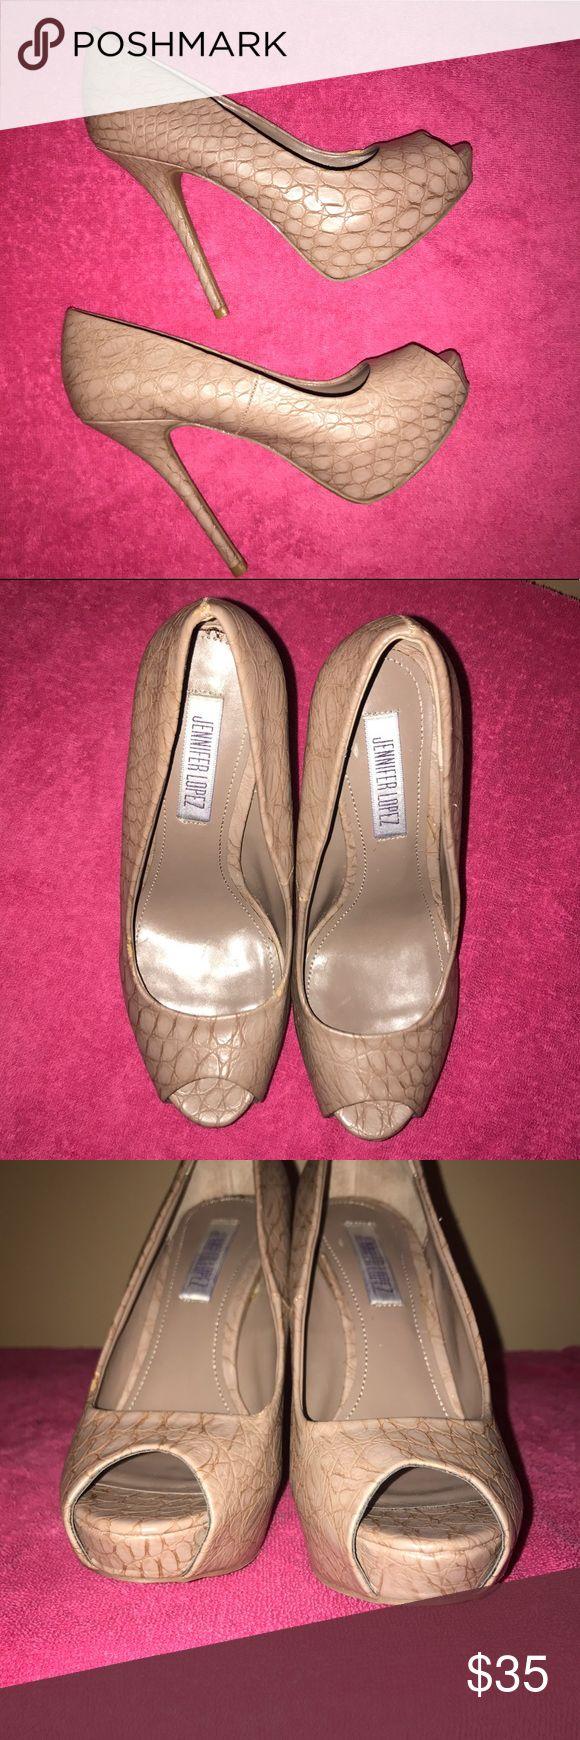 "🆕💙JENNIFER LOPEZ💙Snakeskin Peep Toe Heels/Pumps 🆕LISTING🆕NWOT 💙JENNIFER LOPEZ💙Snakeskin Faux Leather Peep Toe Platform Heels/Pumps. Size - 6. Heel height - 5"", Platform- 1"". Tags have been remove but never worn Jennifer Lopez Shoes Platforms"